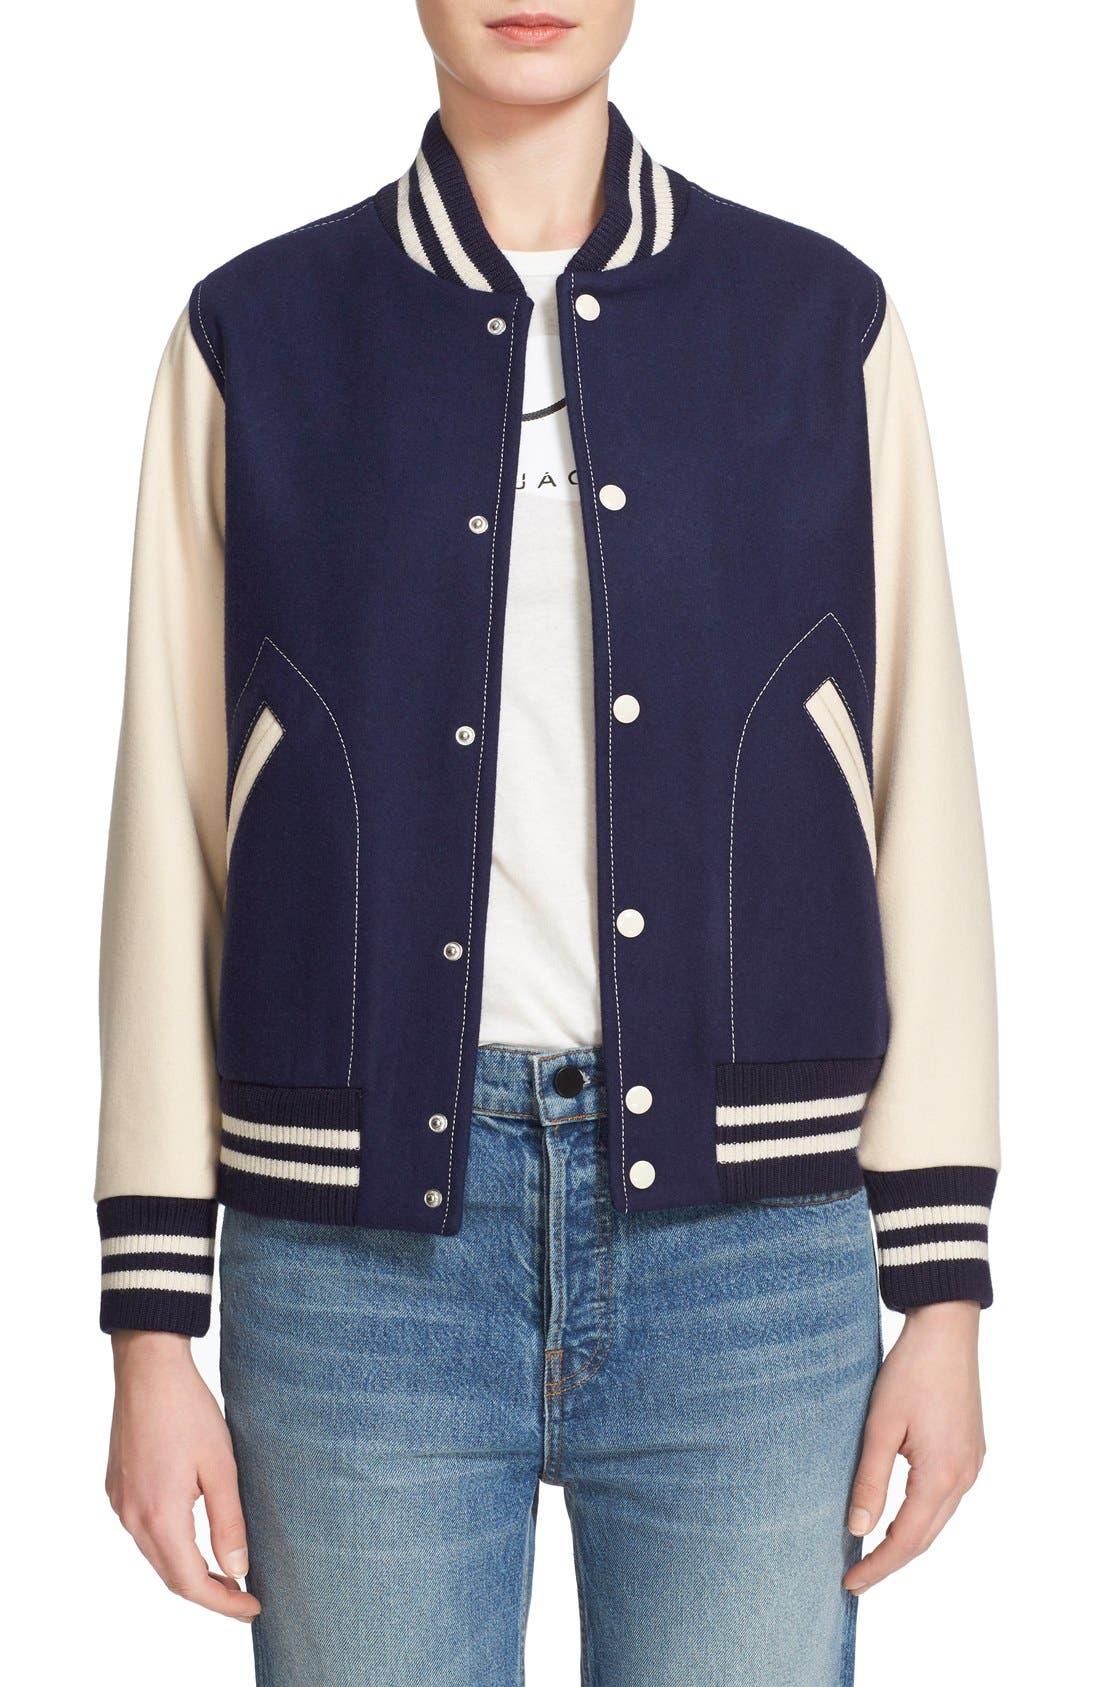 Alternate Image 1 Selected - MARC JACOBS Shrunken Varsity Jacket